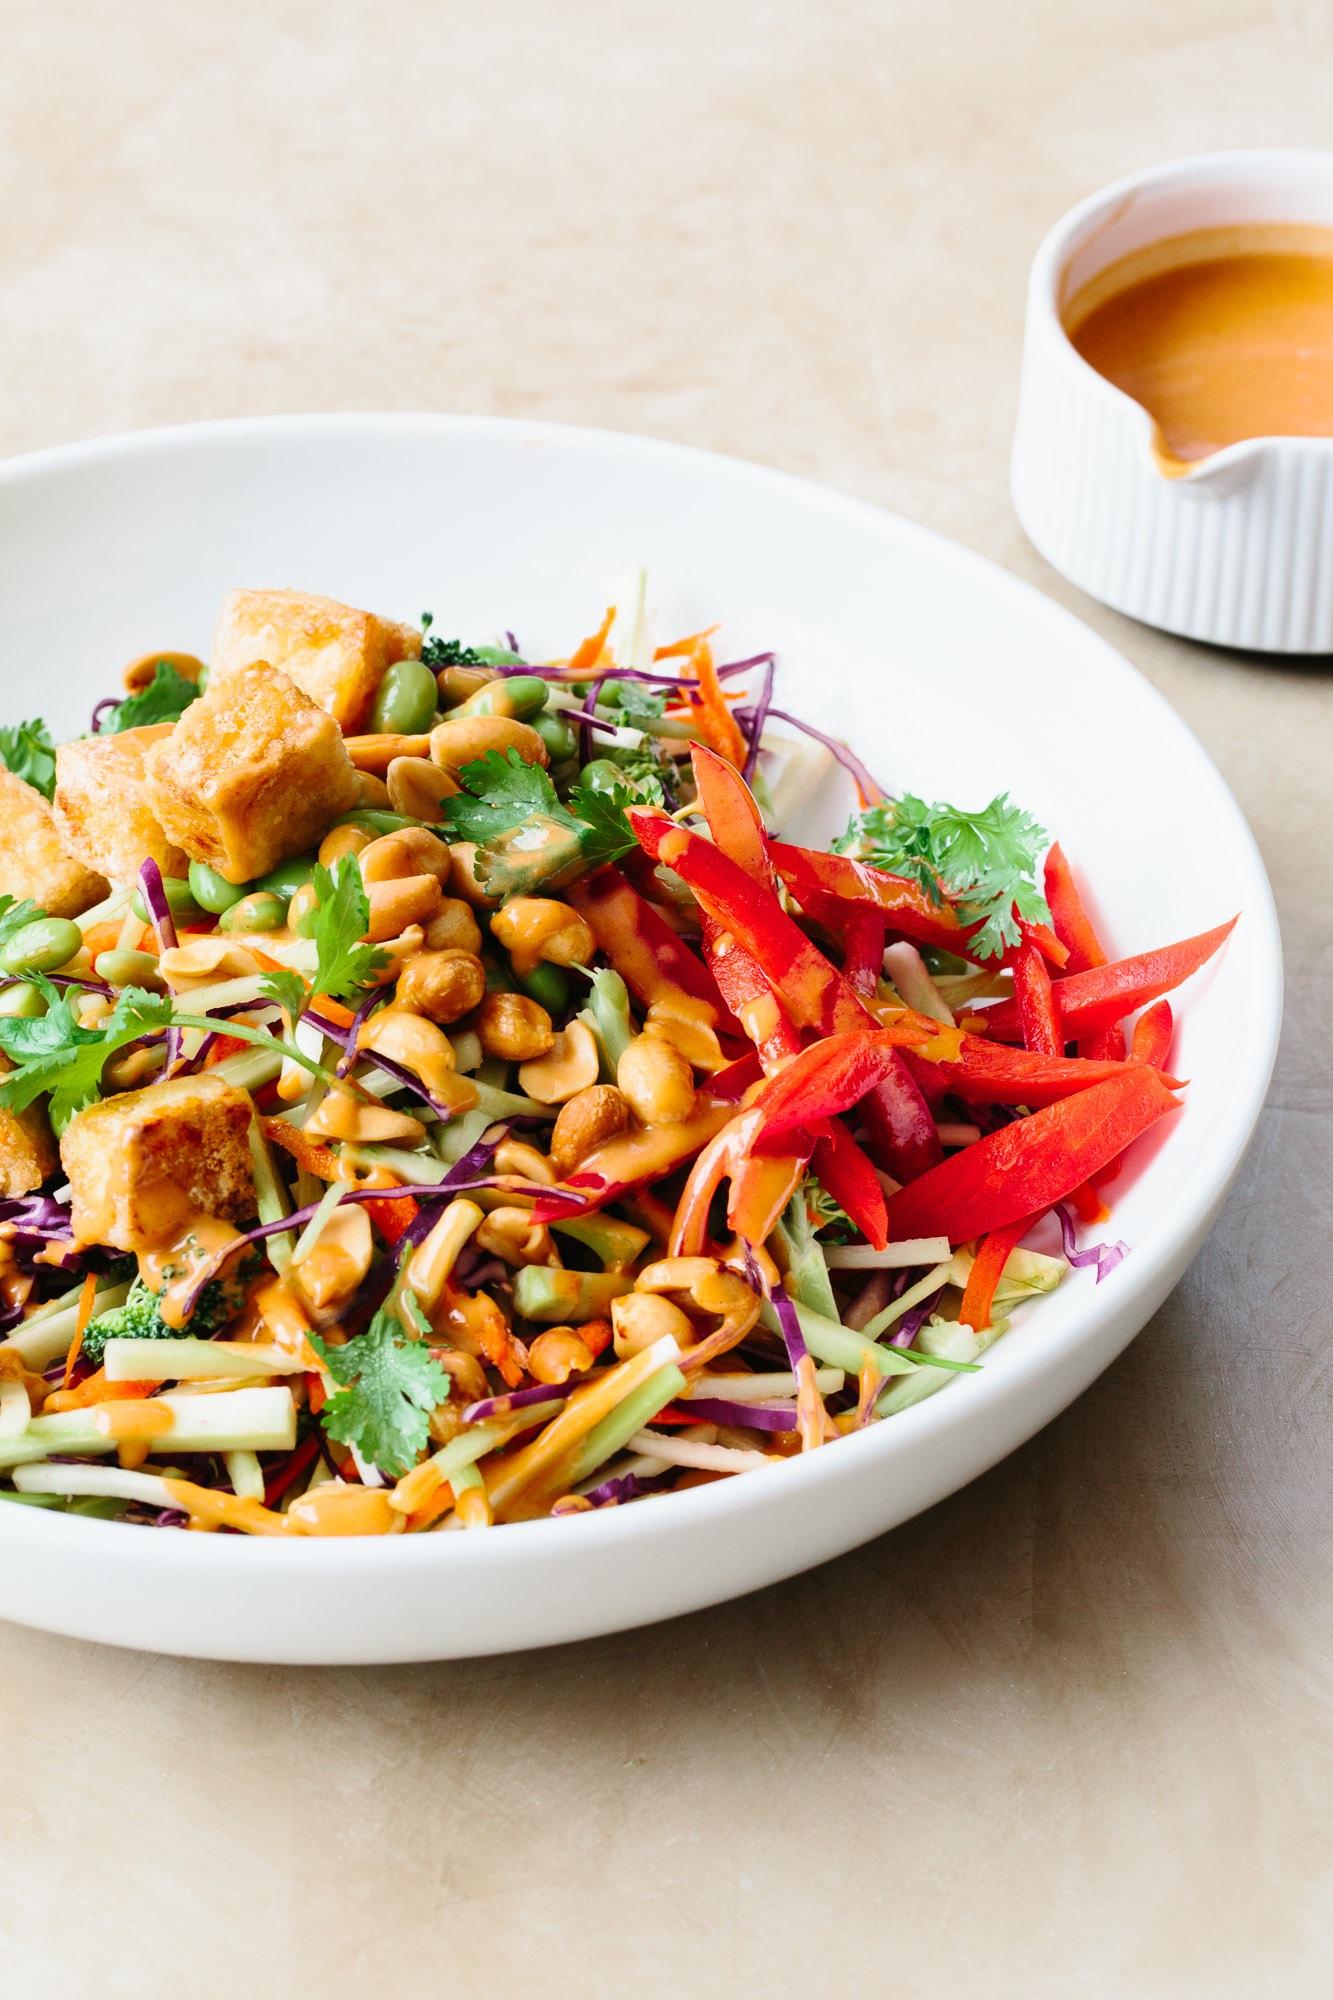 Tofu and Broccoli Salad with Peanut Butter Dressing   KeepRecipes ...